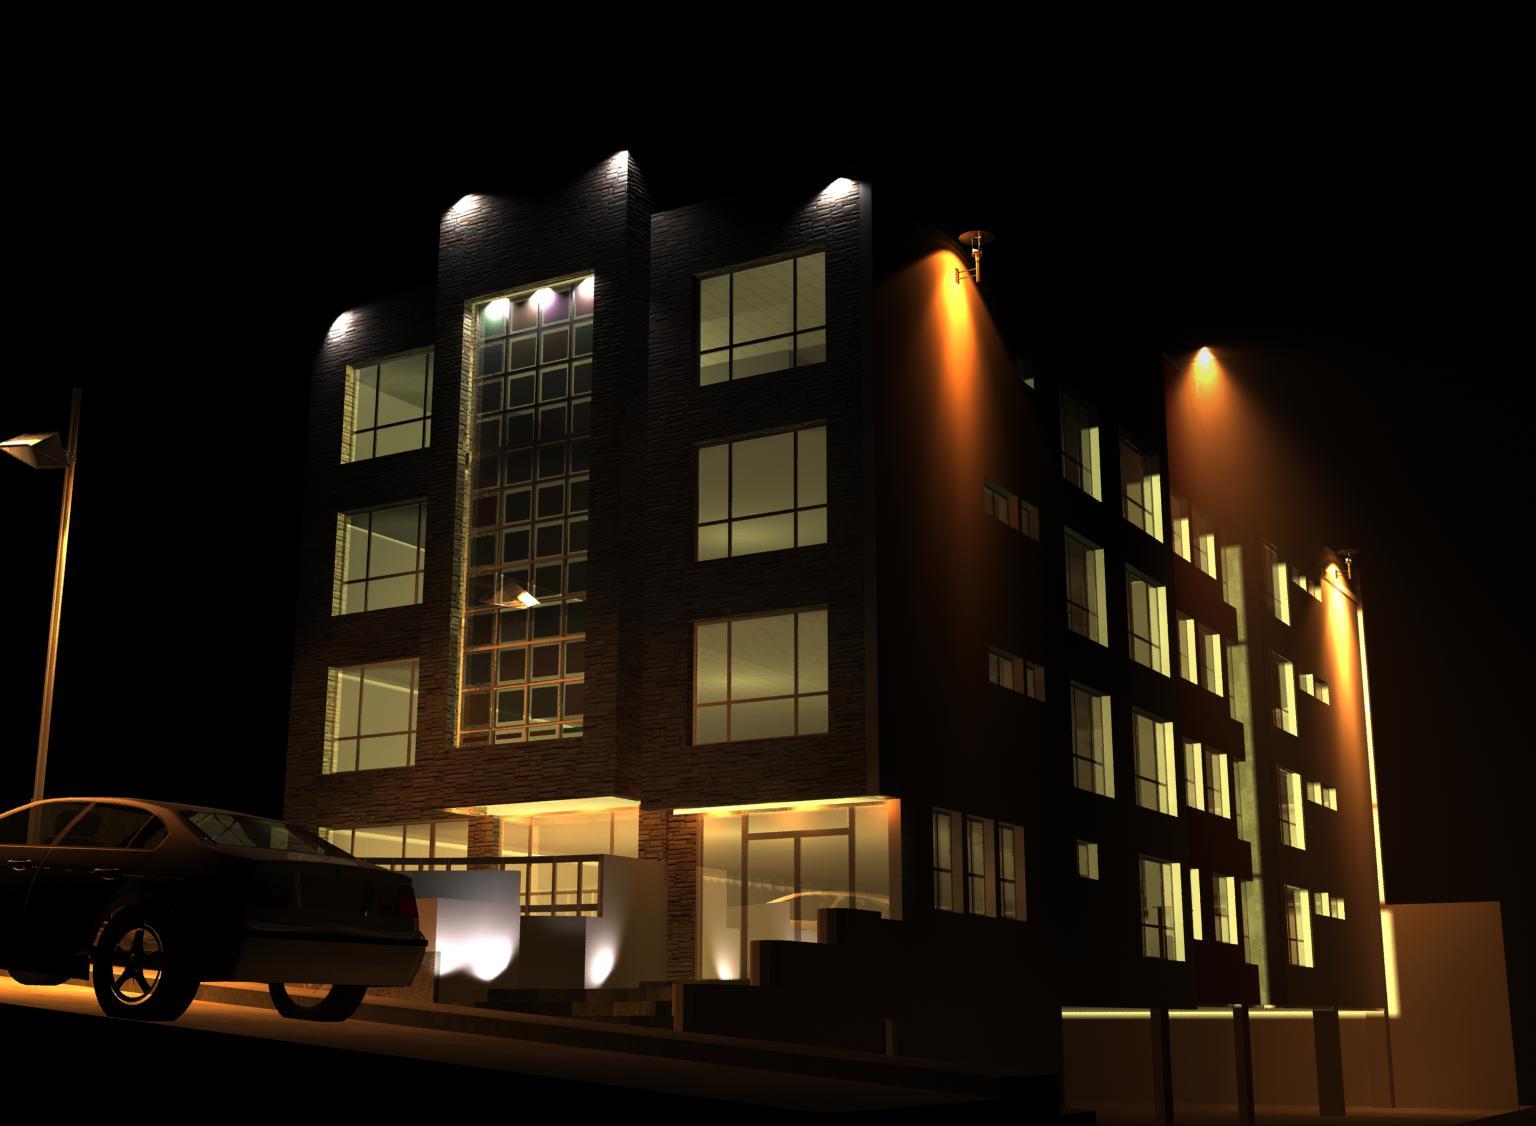 Estudio de iluminacion exterior e interior arq juan carlos c rdenas - Iluminacion exterior ...